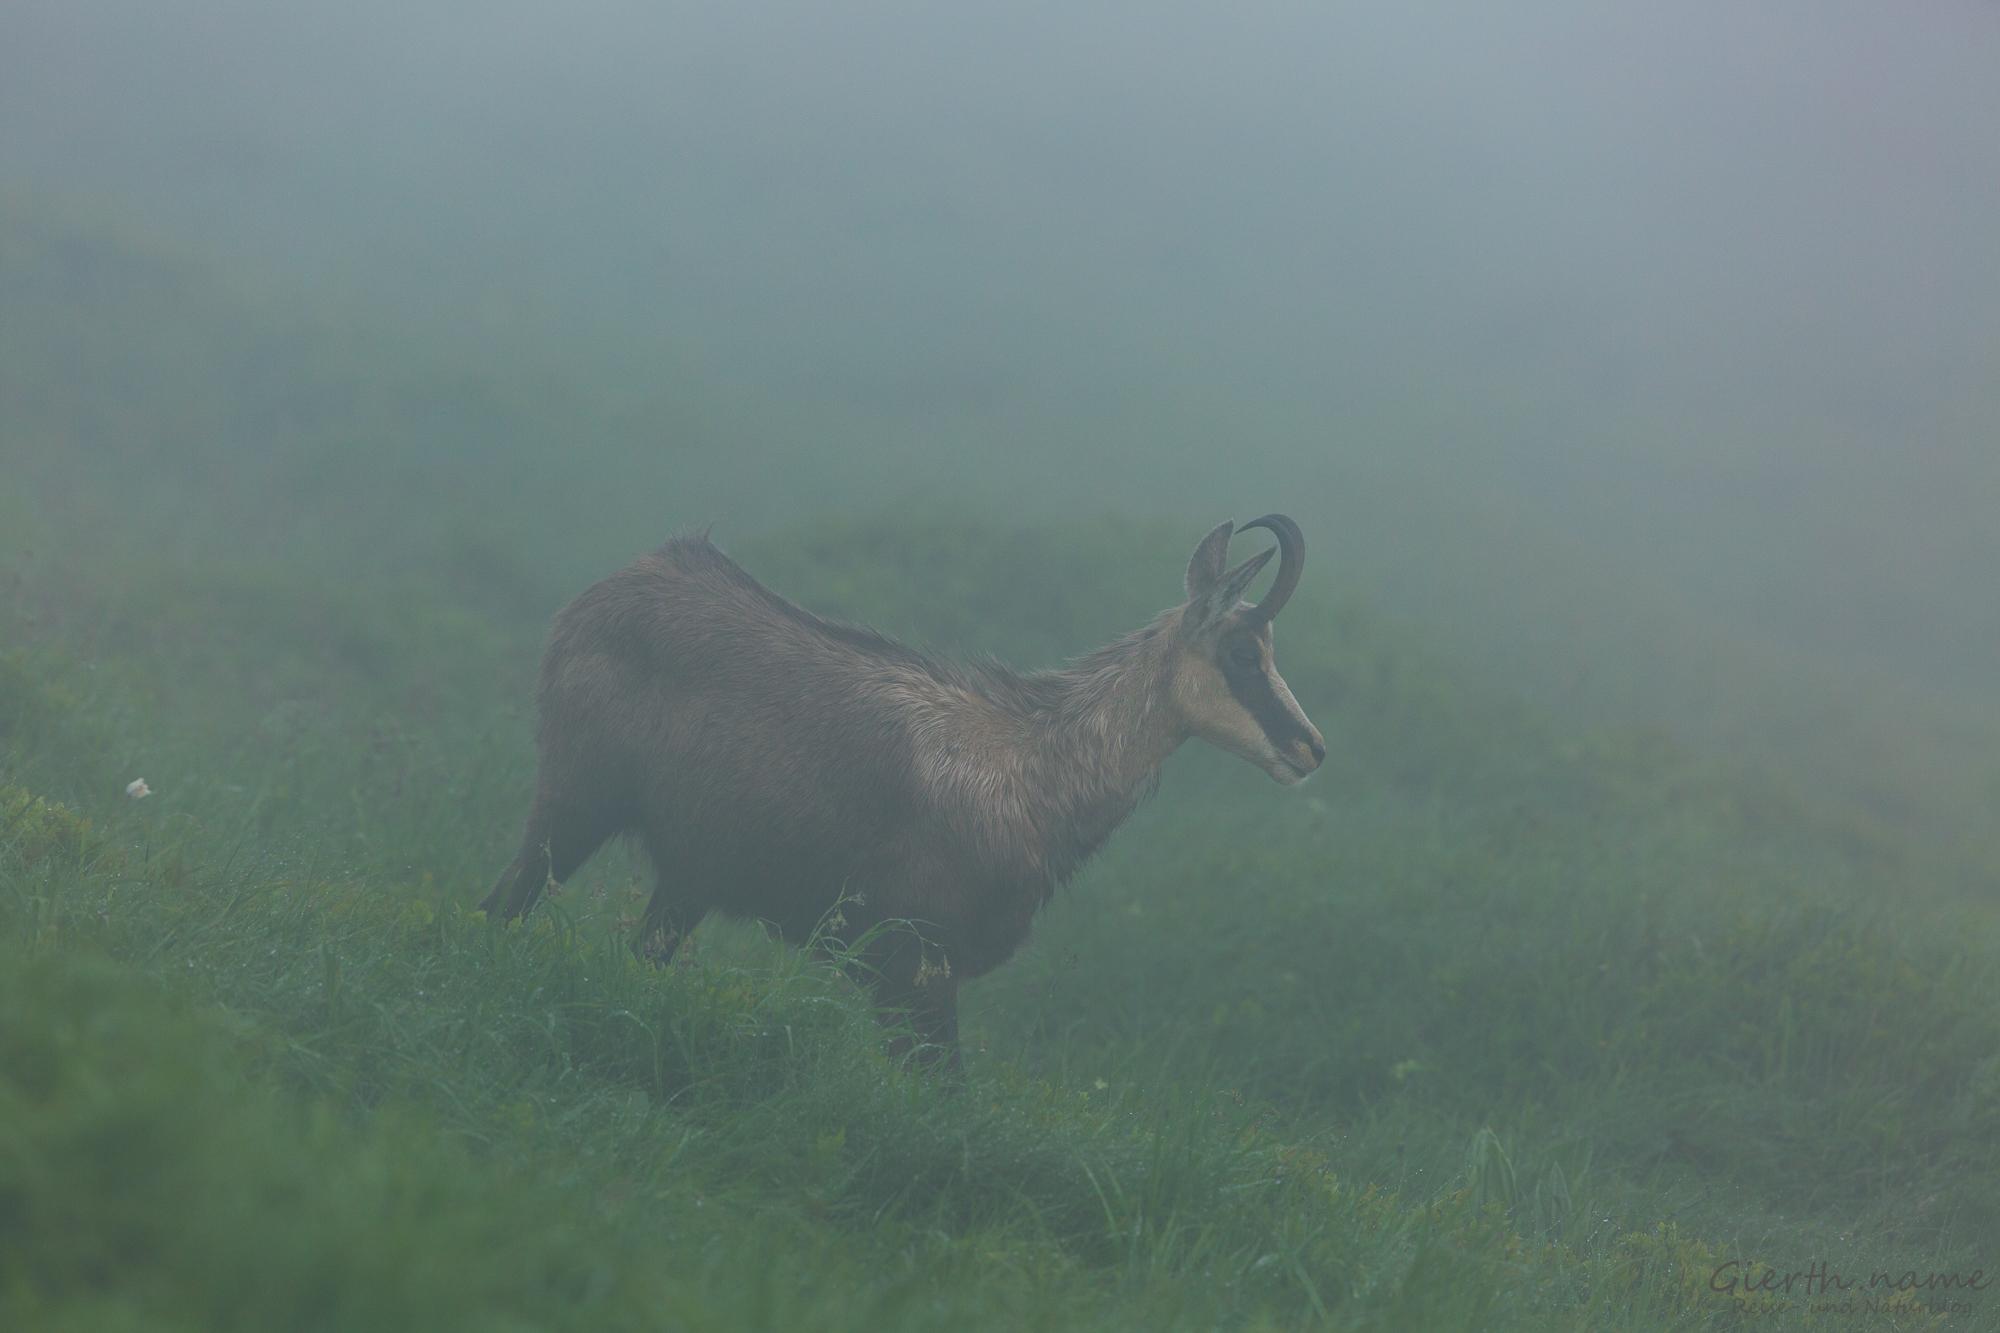 Gämse im Nebel